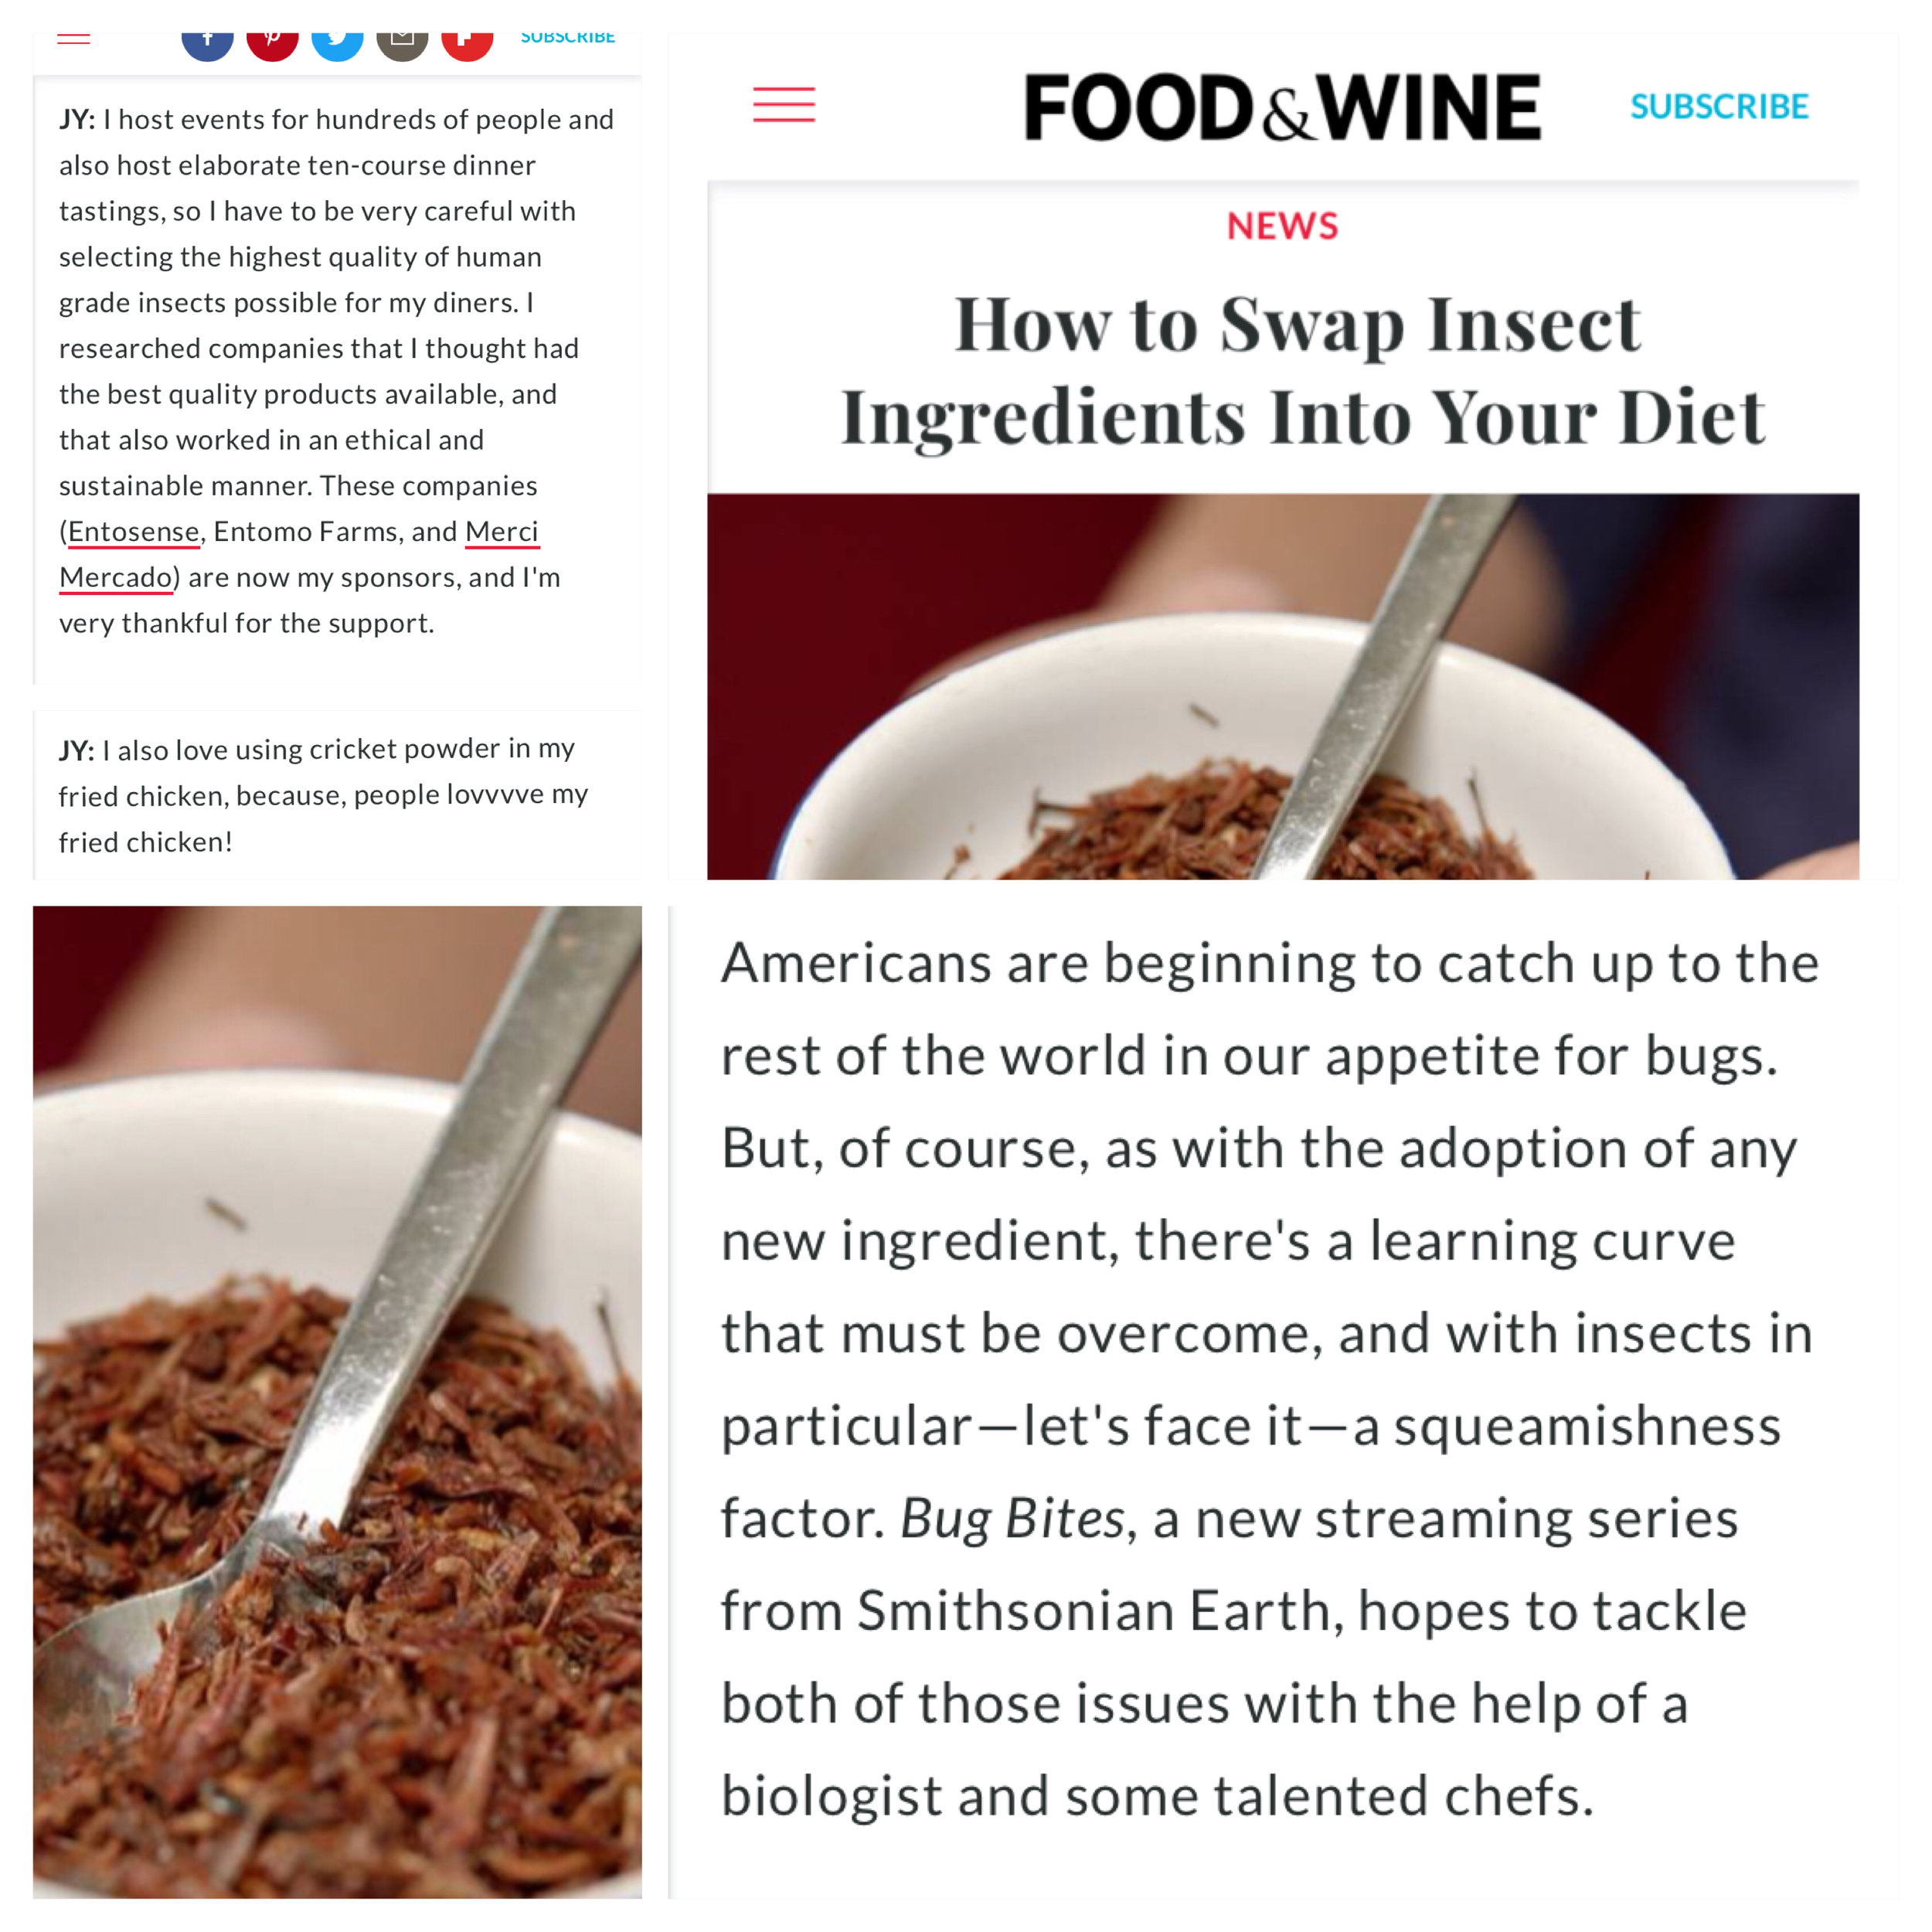 https://www.foodandwine.com/news/insect-ingredients-bug-bites-smithsonian-earth